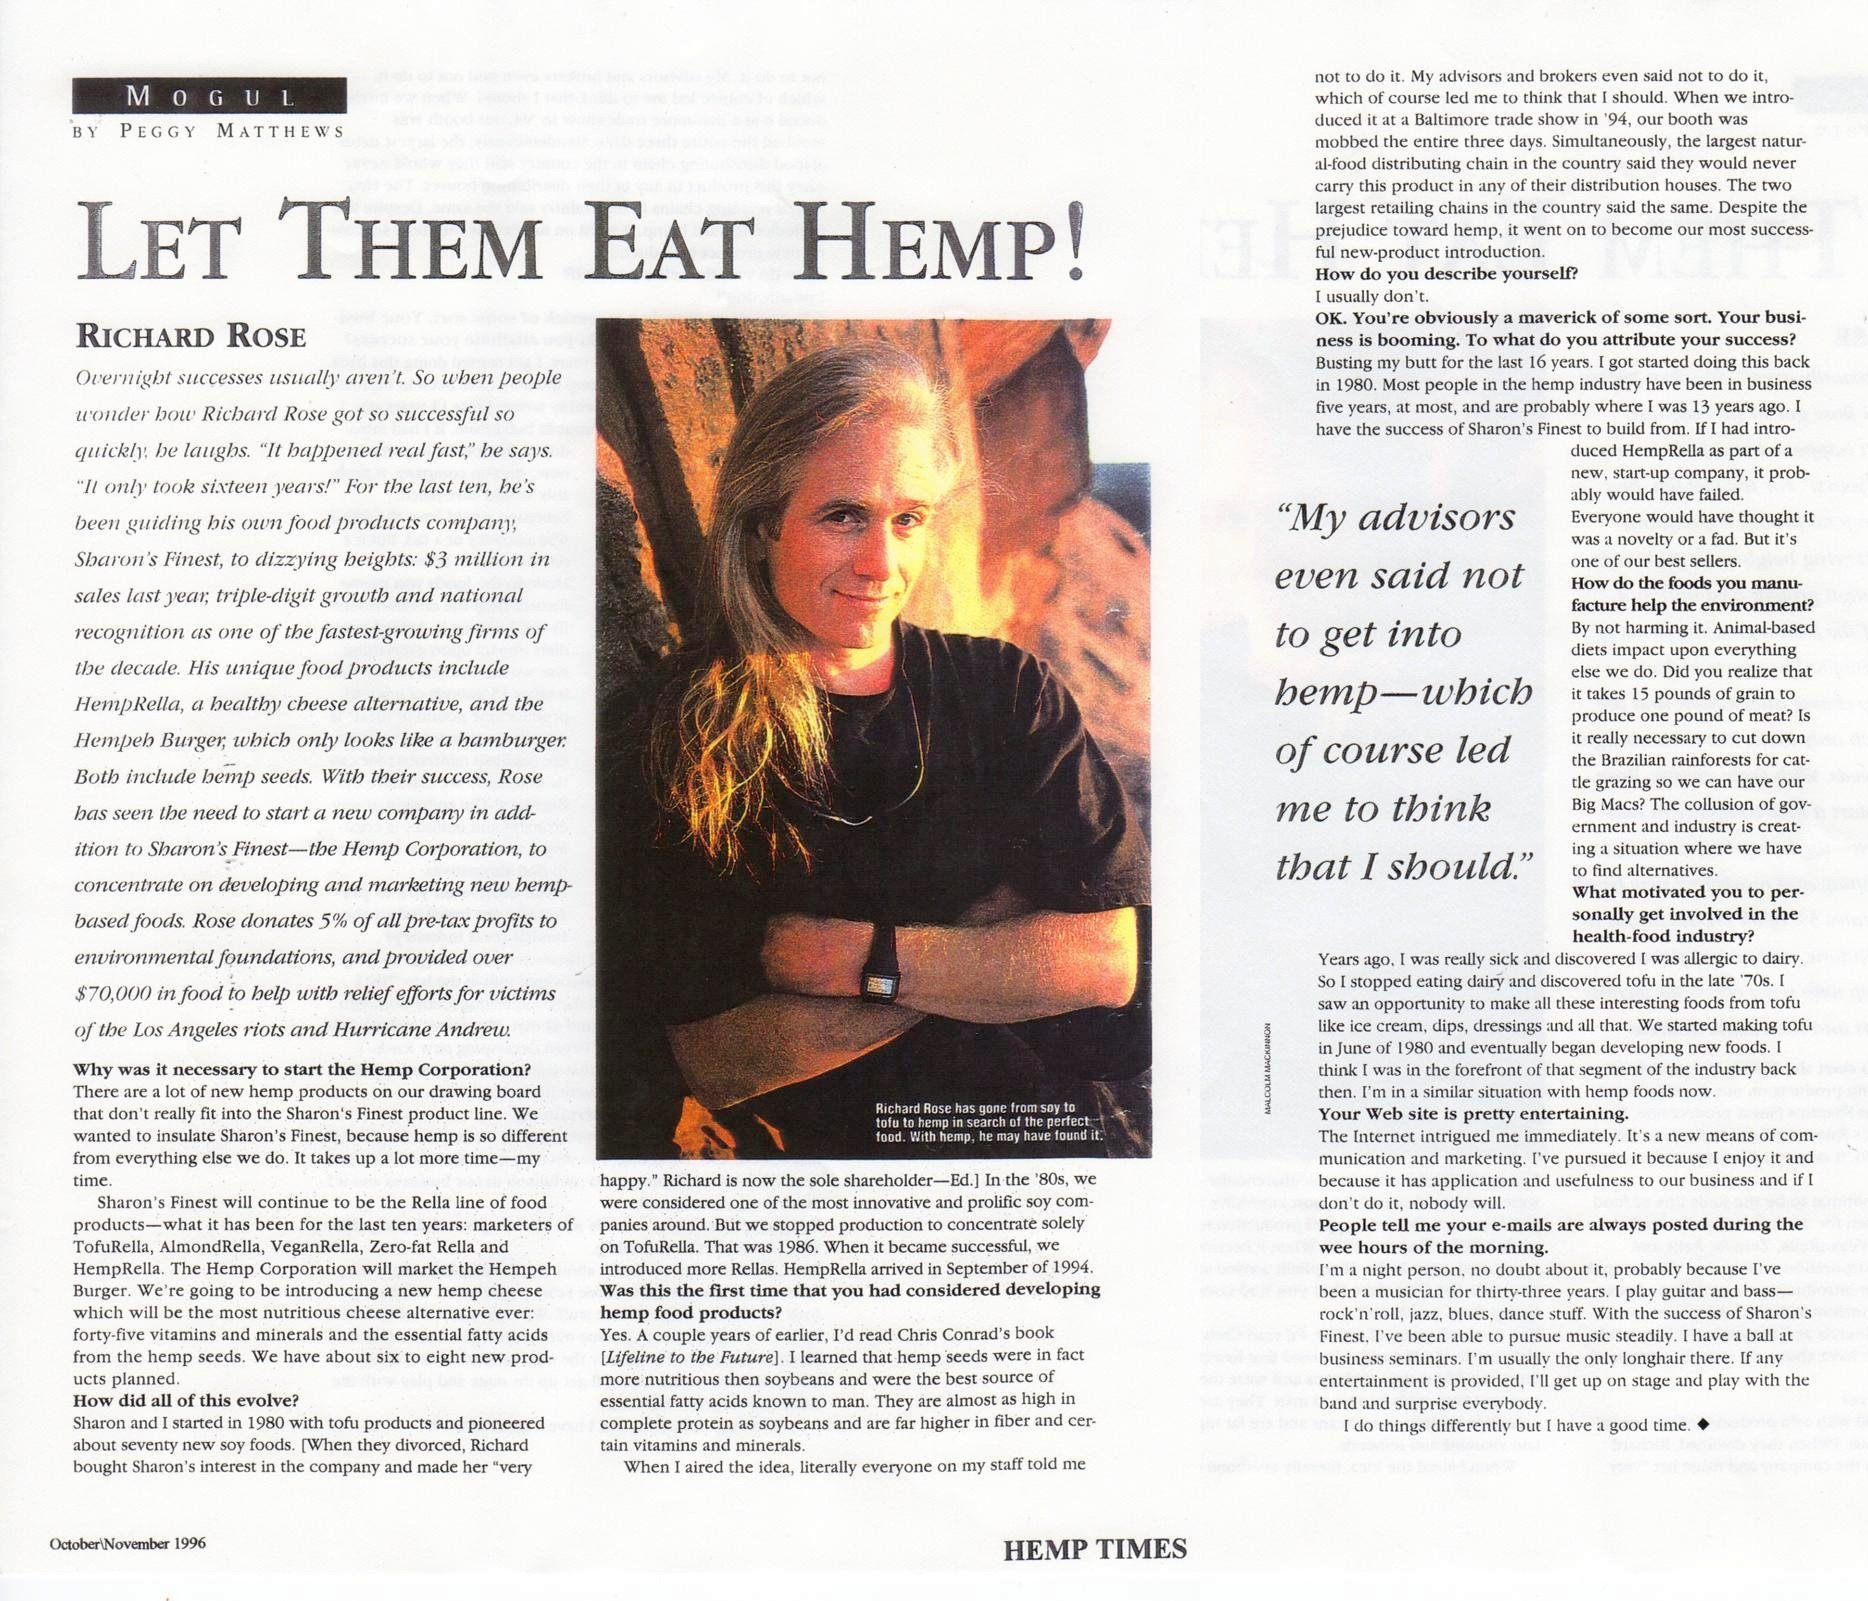 1996: Let Them Eat Hemp!